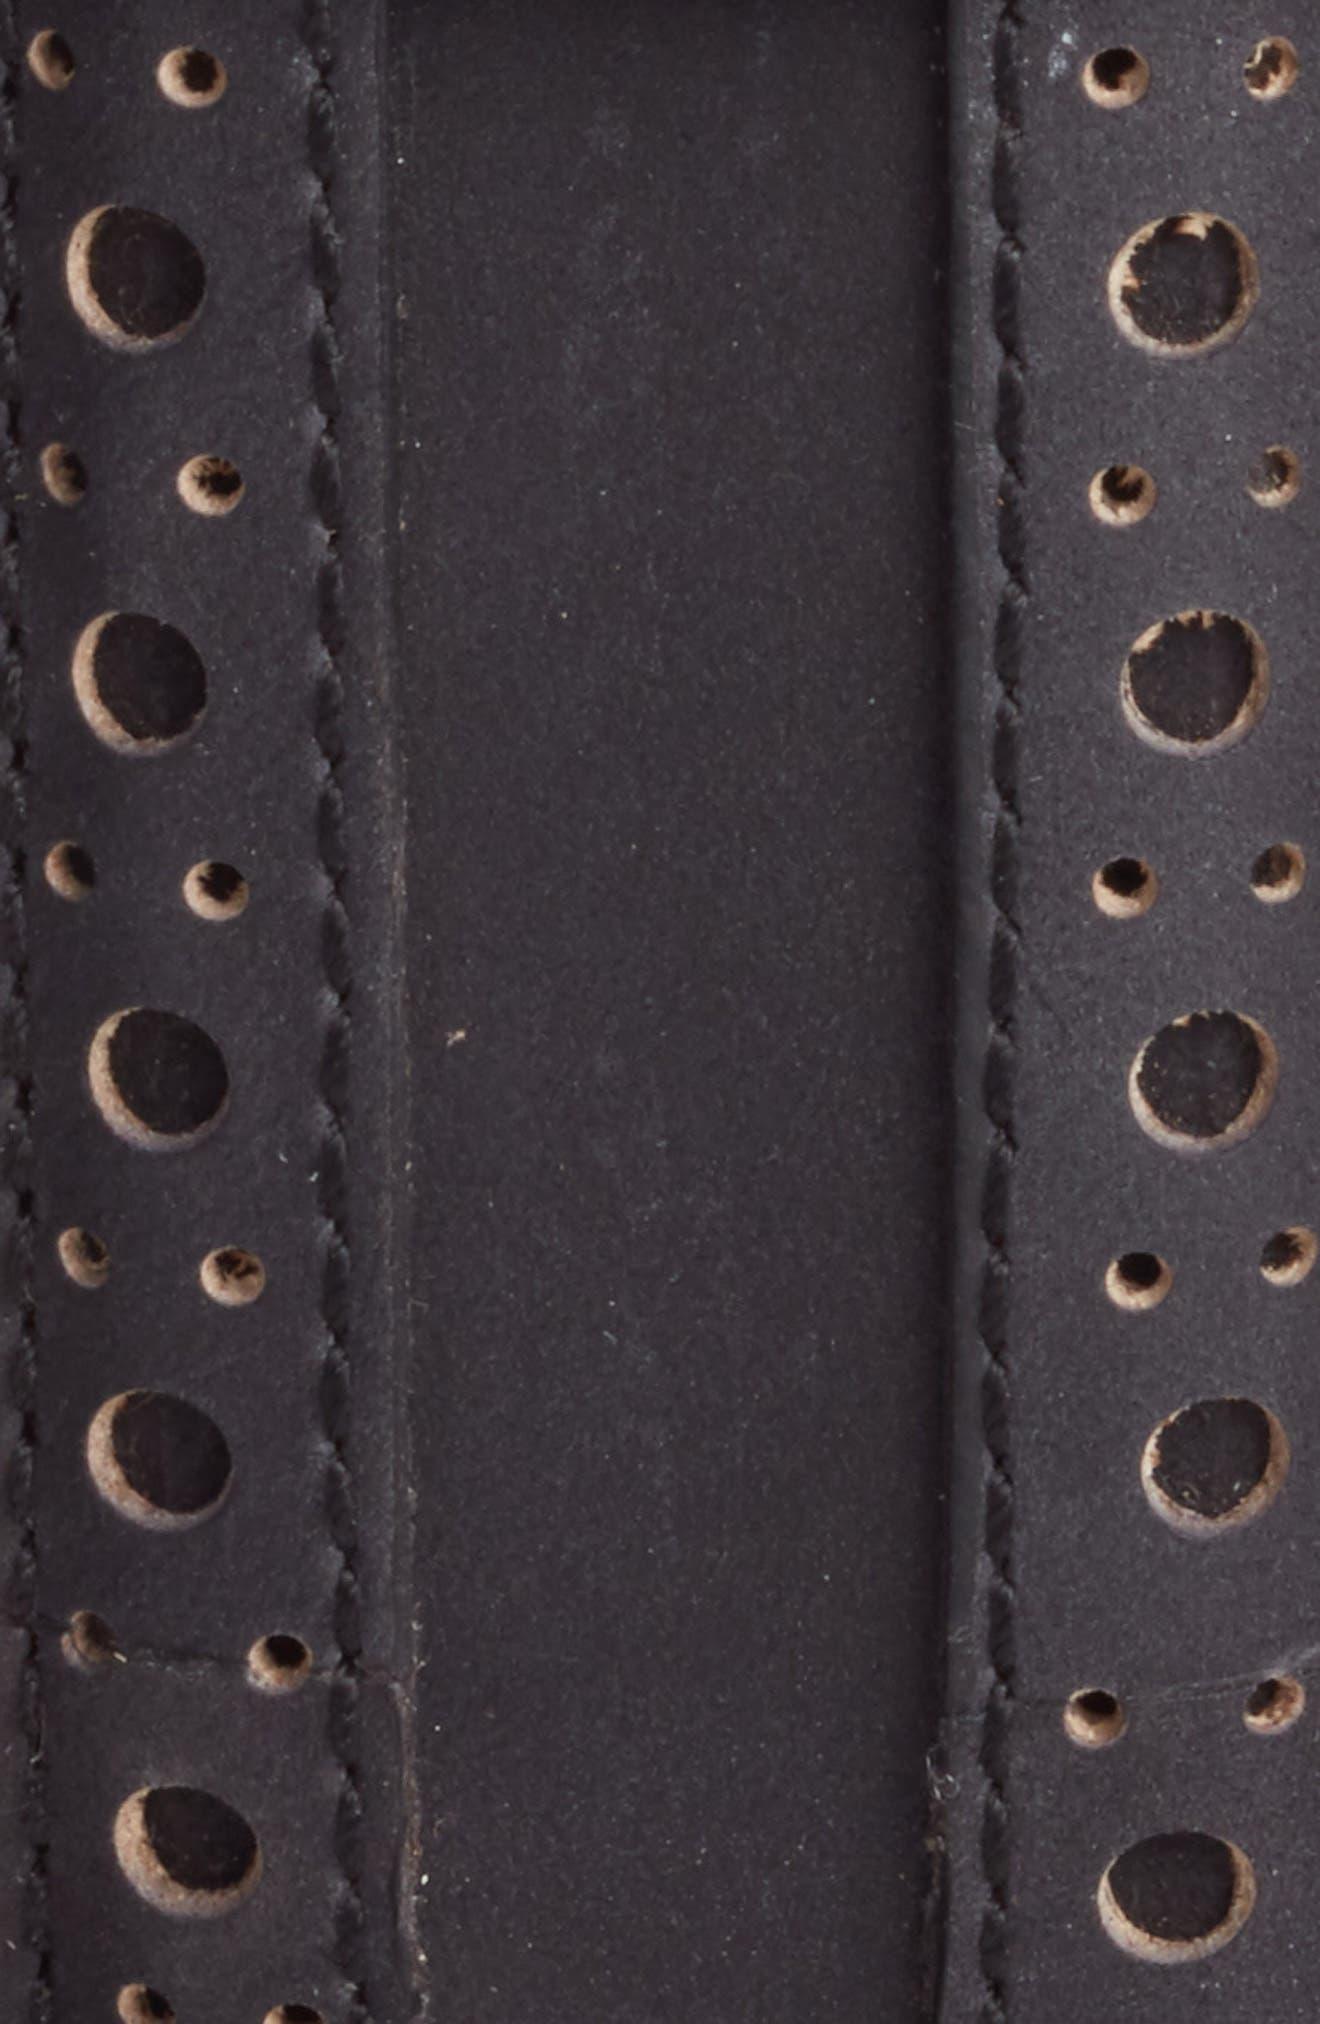 COLE HAAN,                             Brogue Nubuck Leather Belt,                             Alternate thumbnail 2, color,                             001